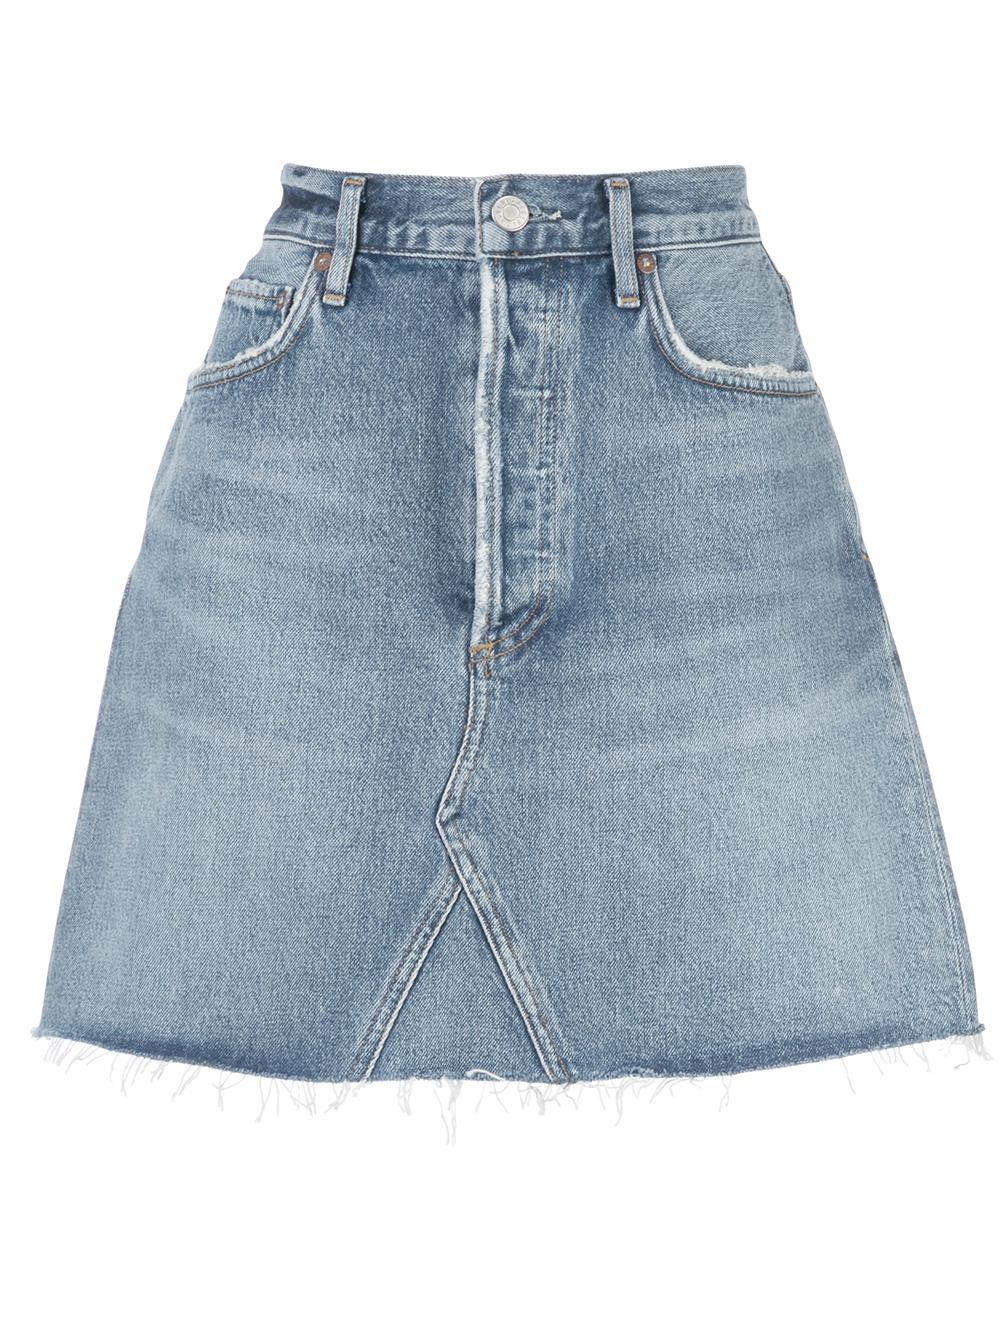 Ada High Rise Mid Length Denim Skirt Item # A125-1141